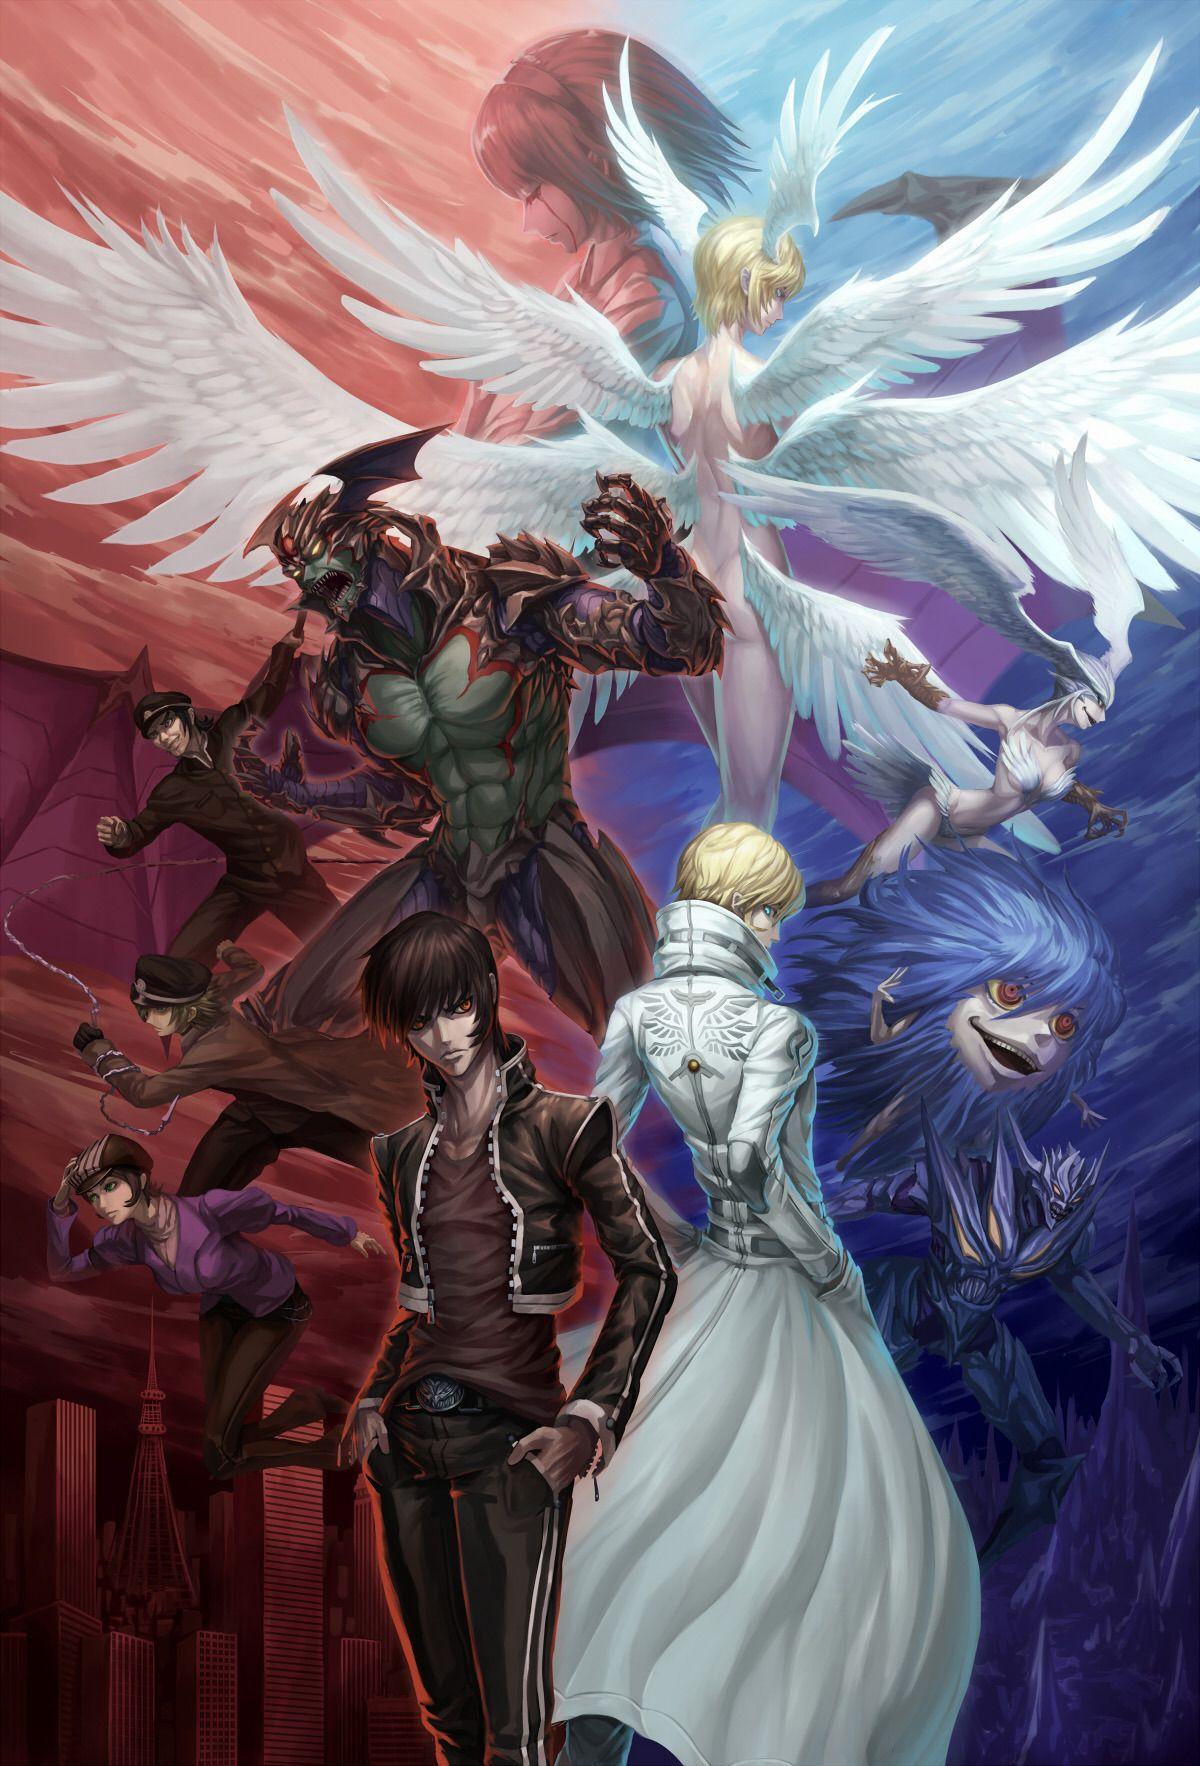 AKIRA FUDO'S BELT in 2020 Anime, Akira, Anime images